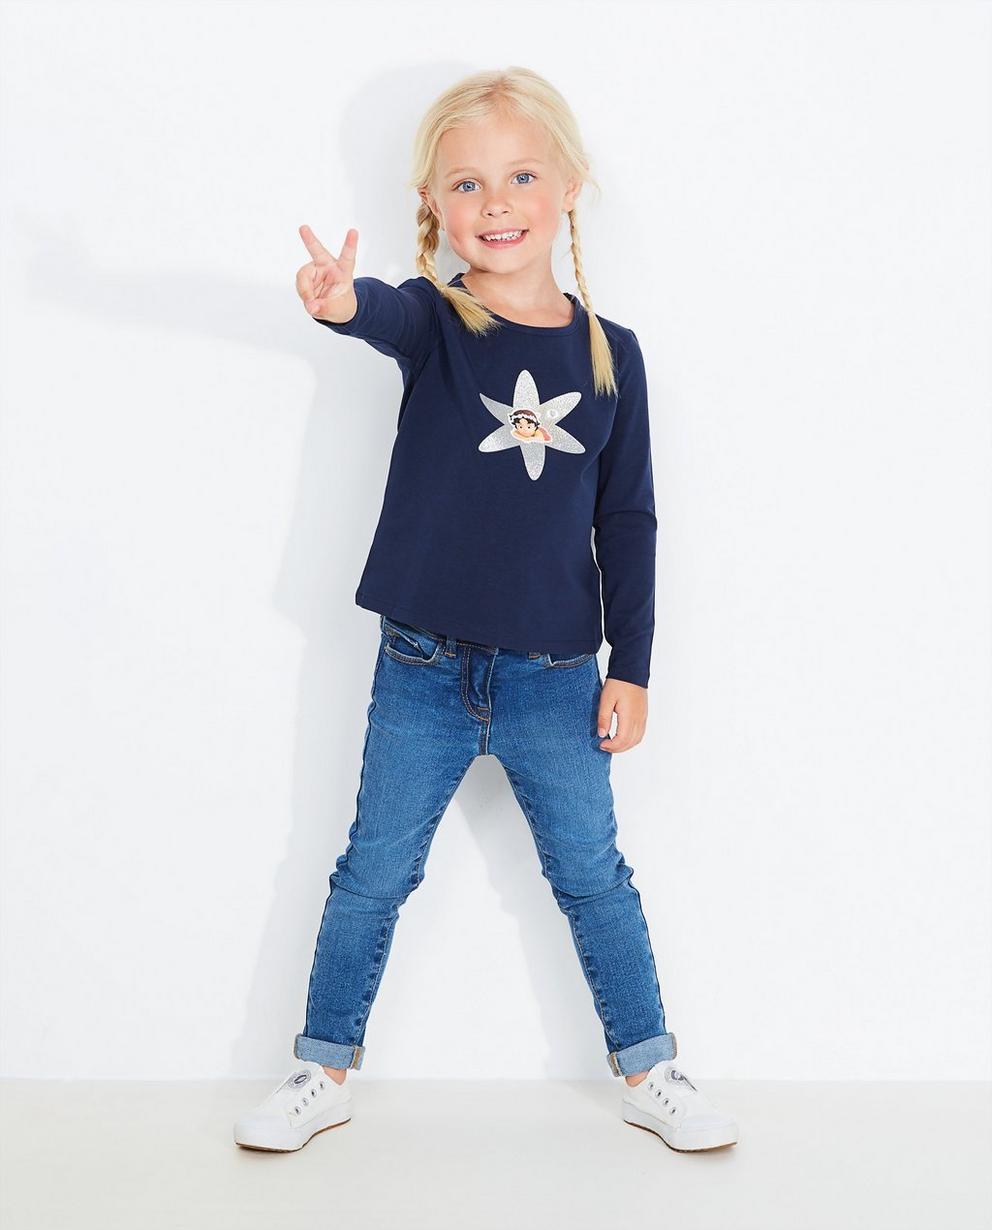 T-shirt à manches longues - imprimé, bleu marine, Maya - Heidi